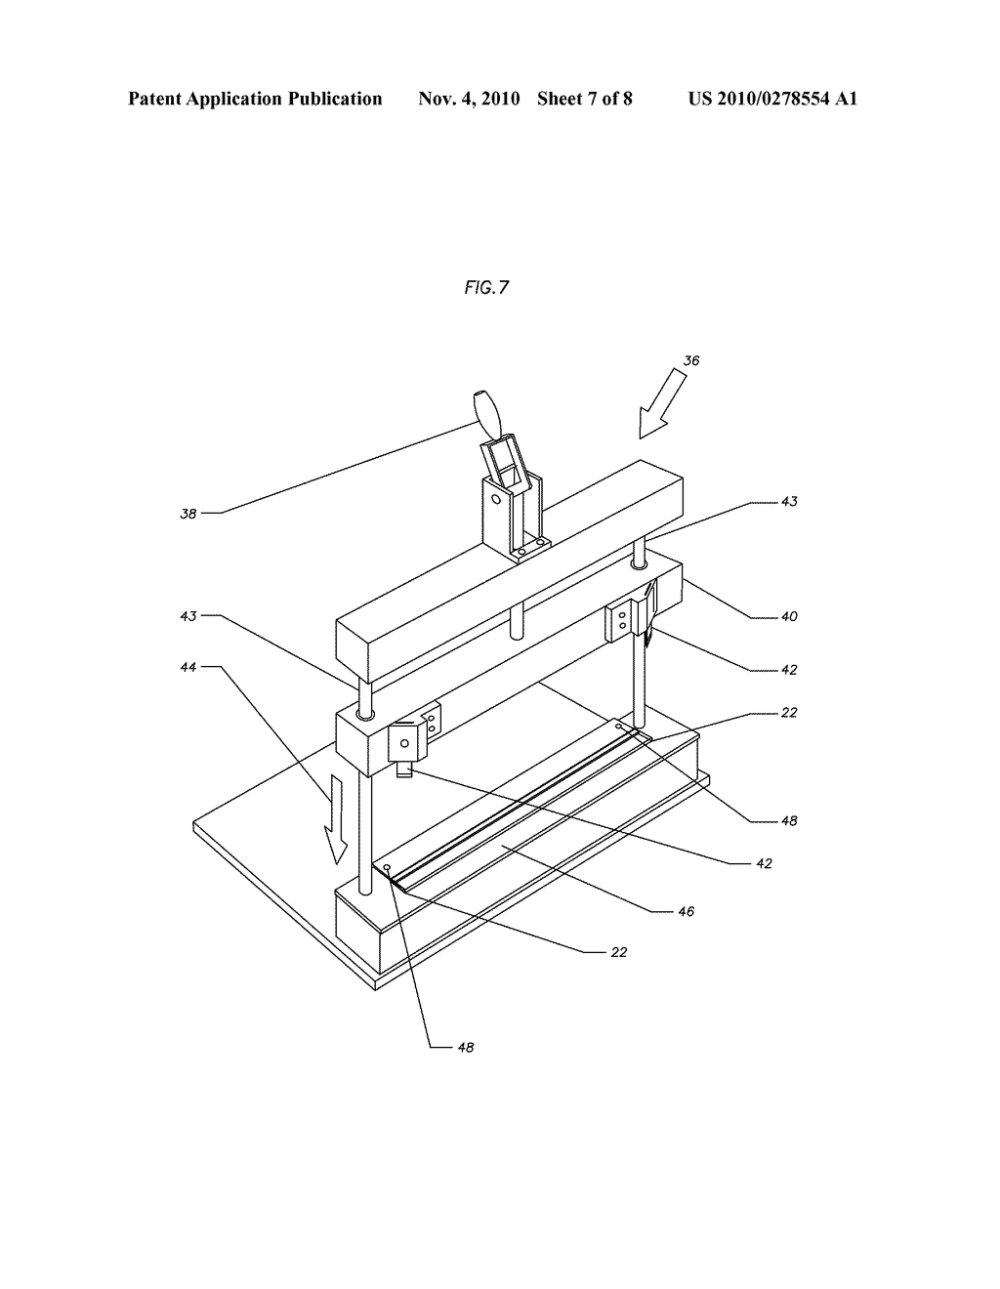 medium resolution of laser printer toner cartridge cleaning blade diagram schematic and image 08